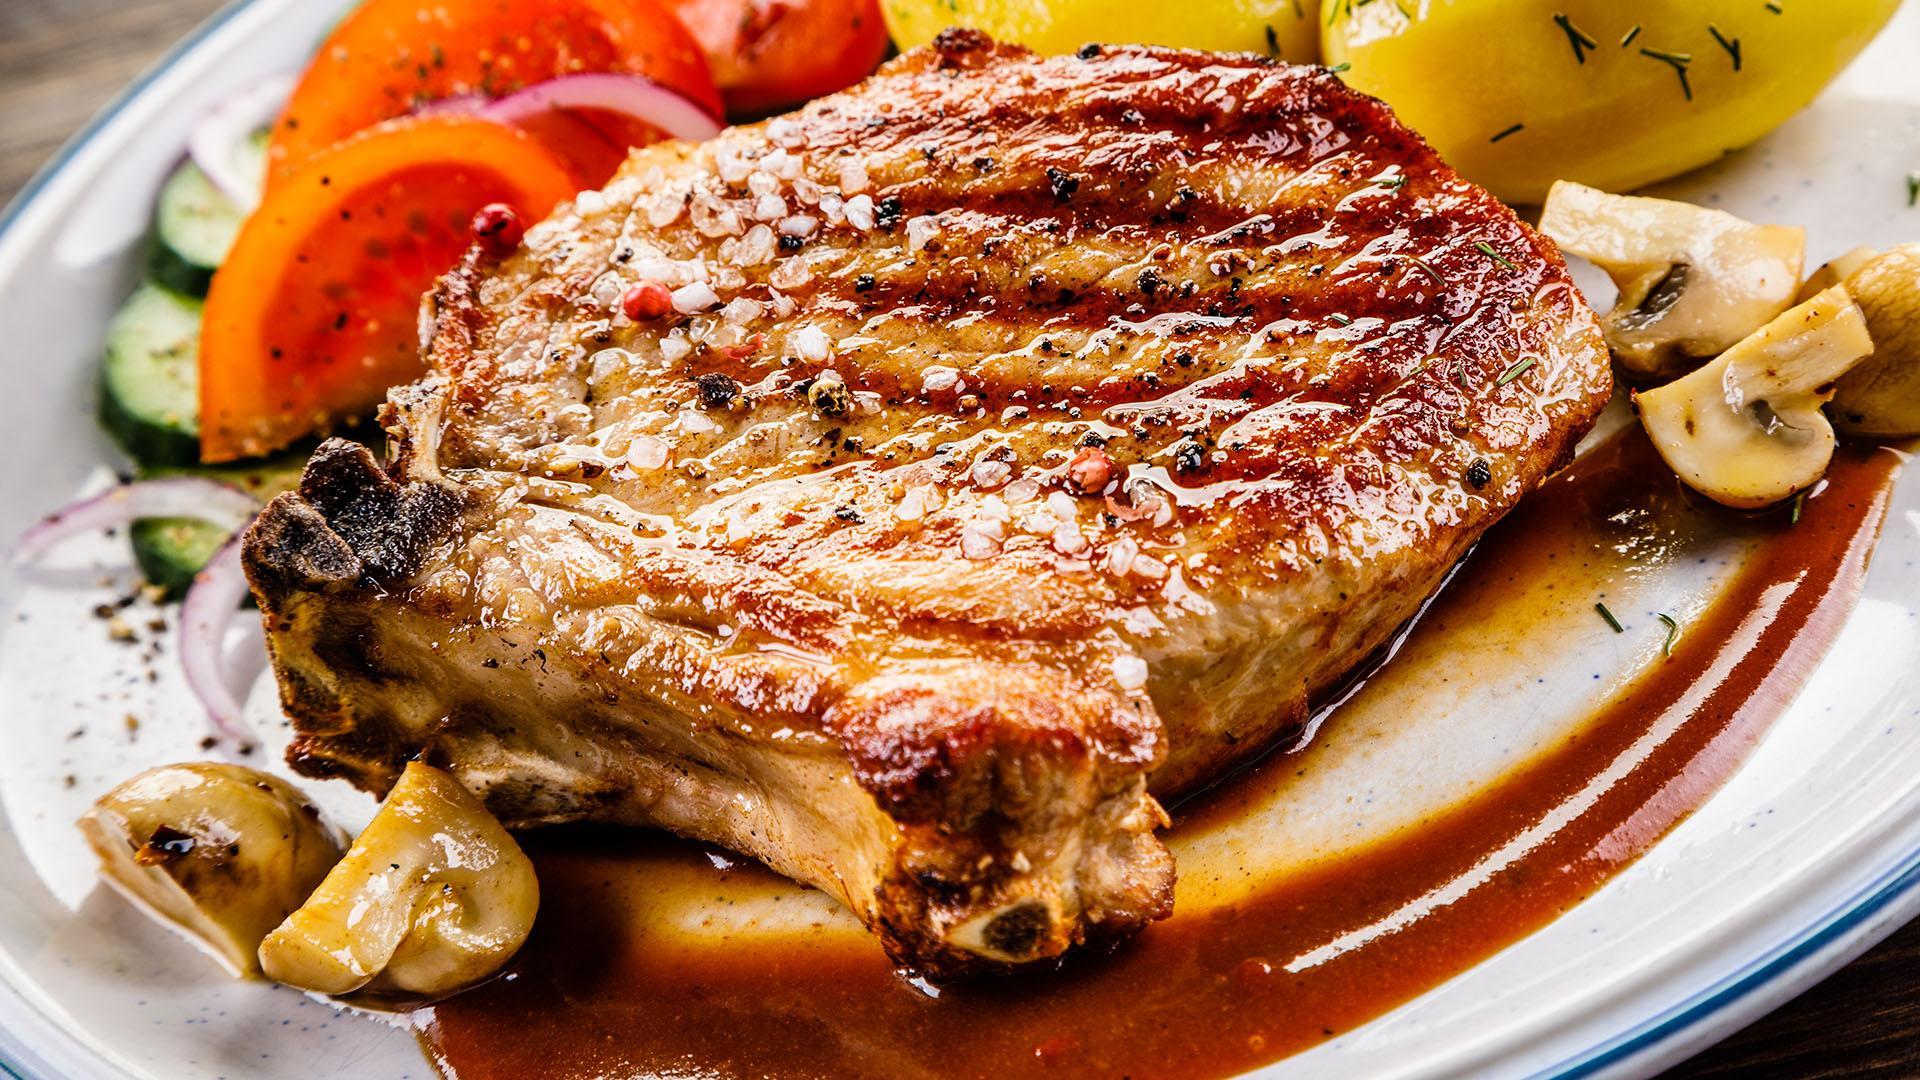 Curtis Stone S Pork Chops With Cider Dijon Pan Sauce And Roast